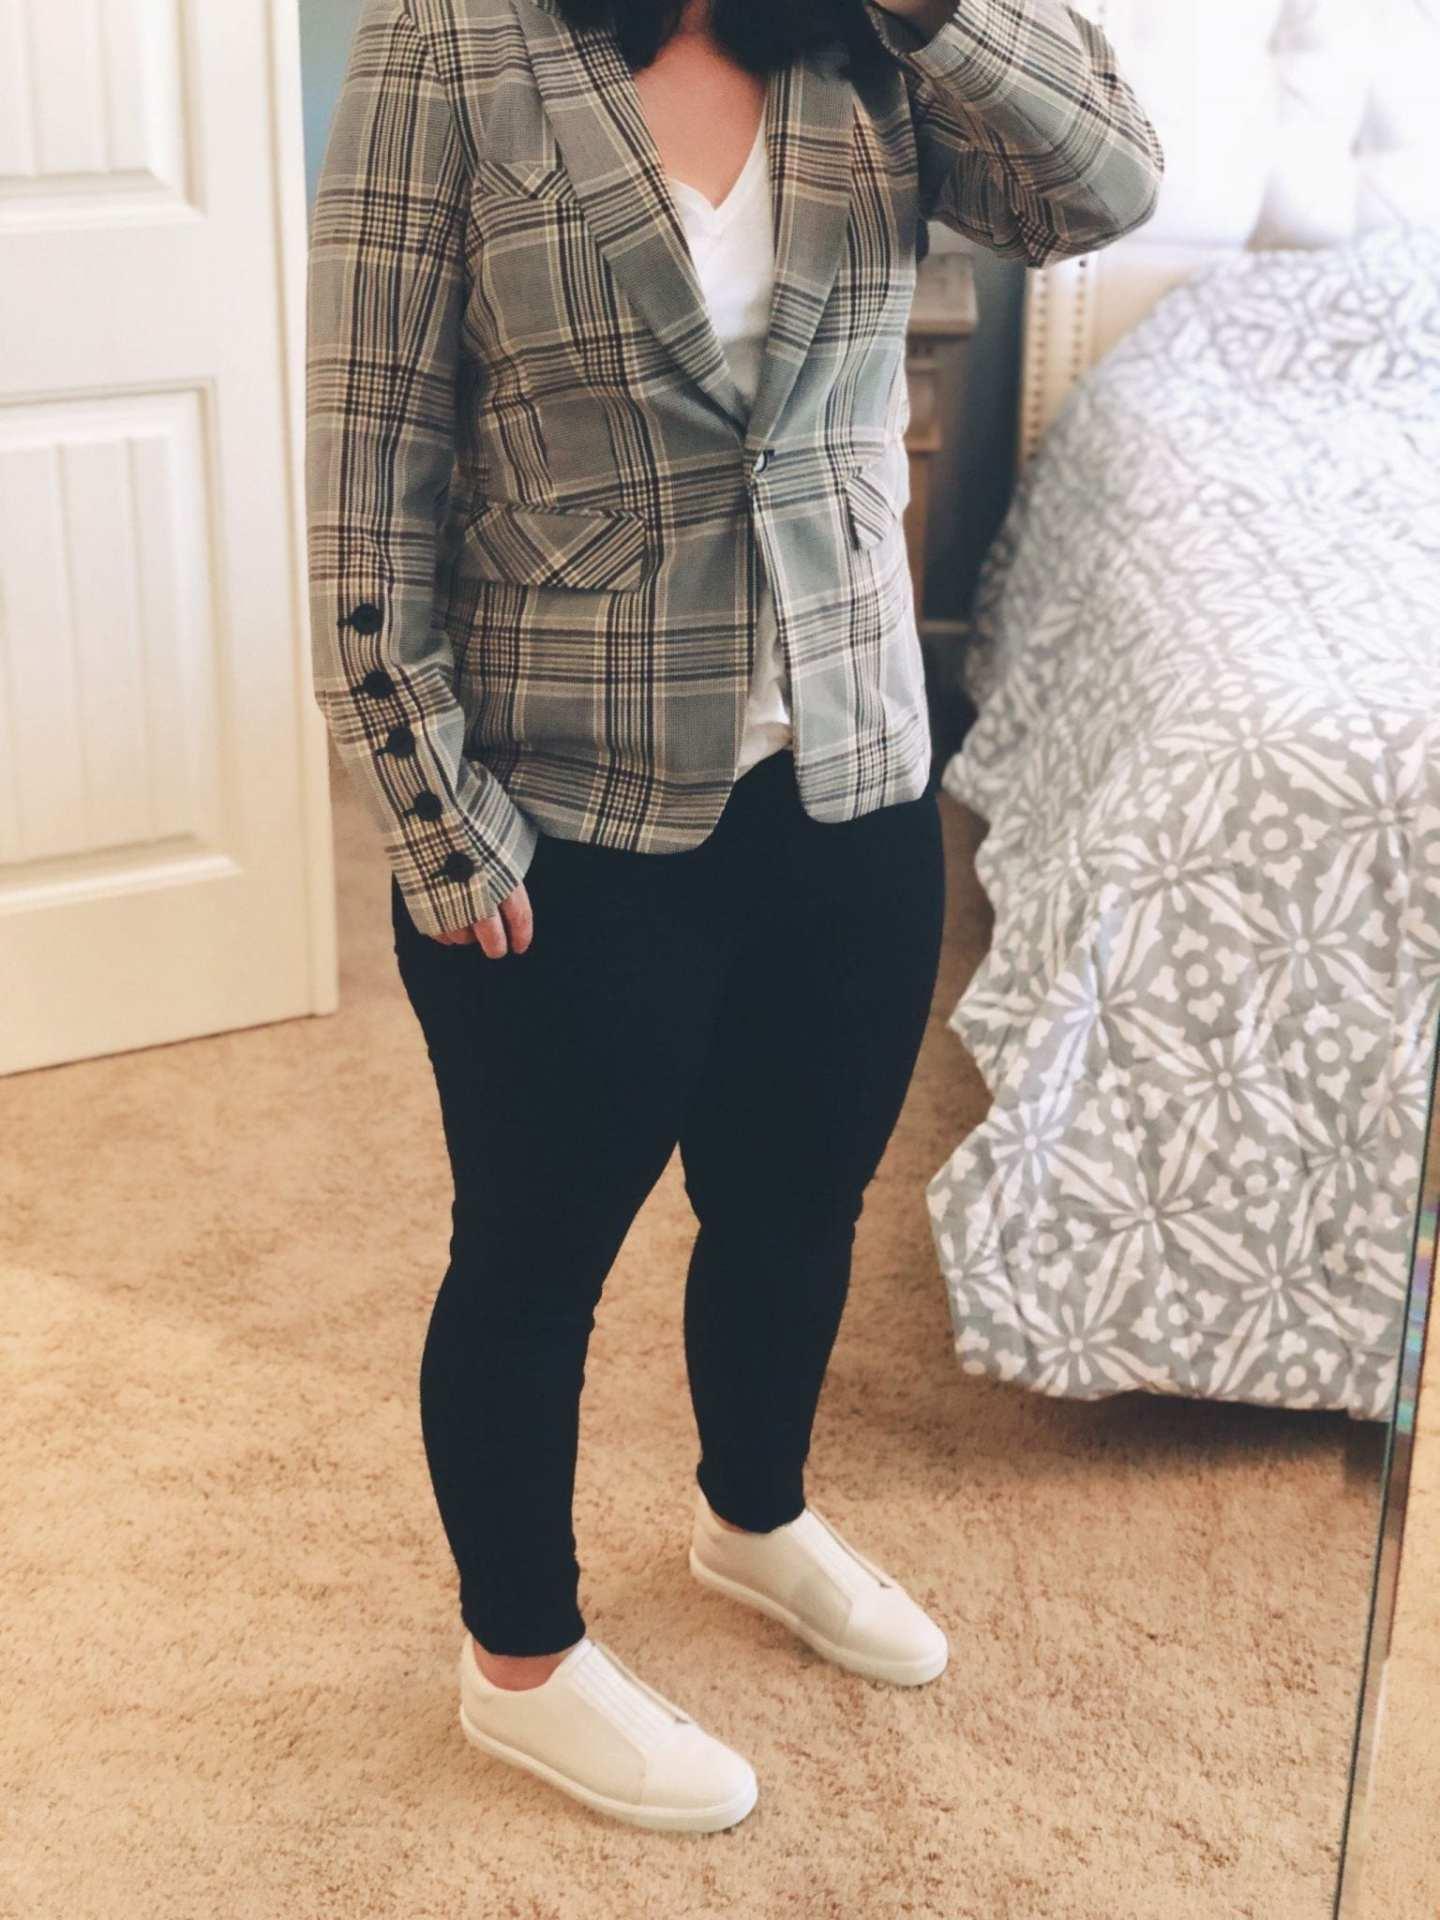 Steel Jacket with Removable Turtleneck Dickey VERONICA BEARD, Nordstrom Anniversary Sale 2018, Vince Cantara Slip-On Sneakers, Rag & Bone Raw Ankle Skinny Black Jeans